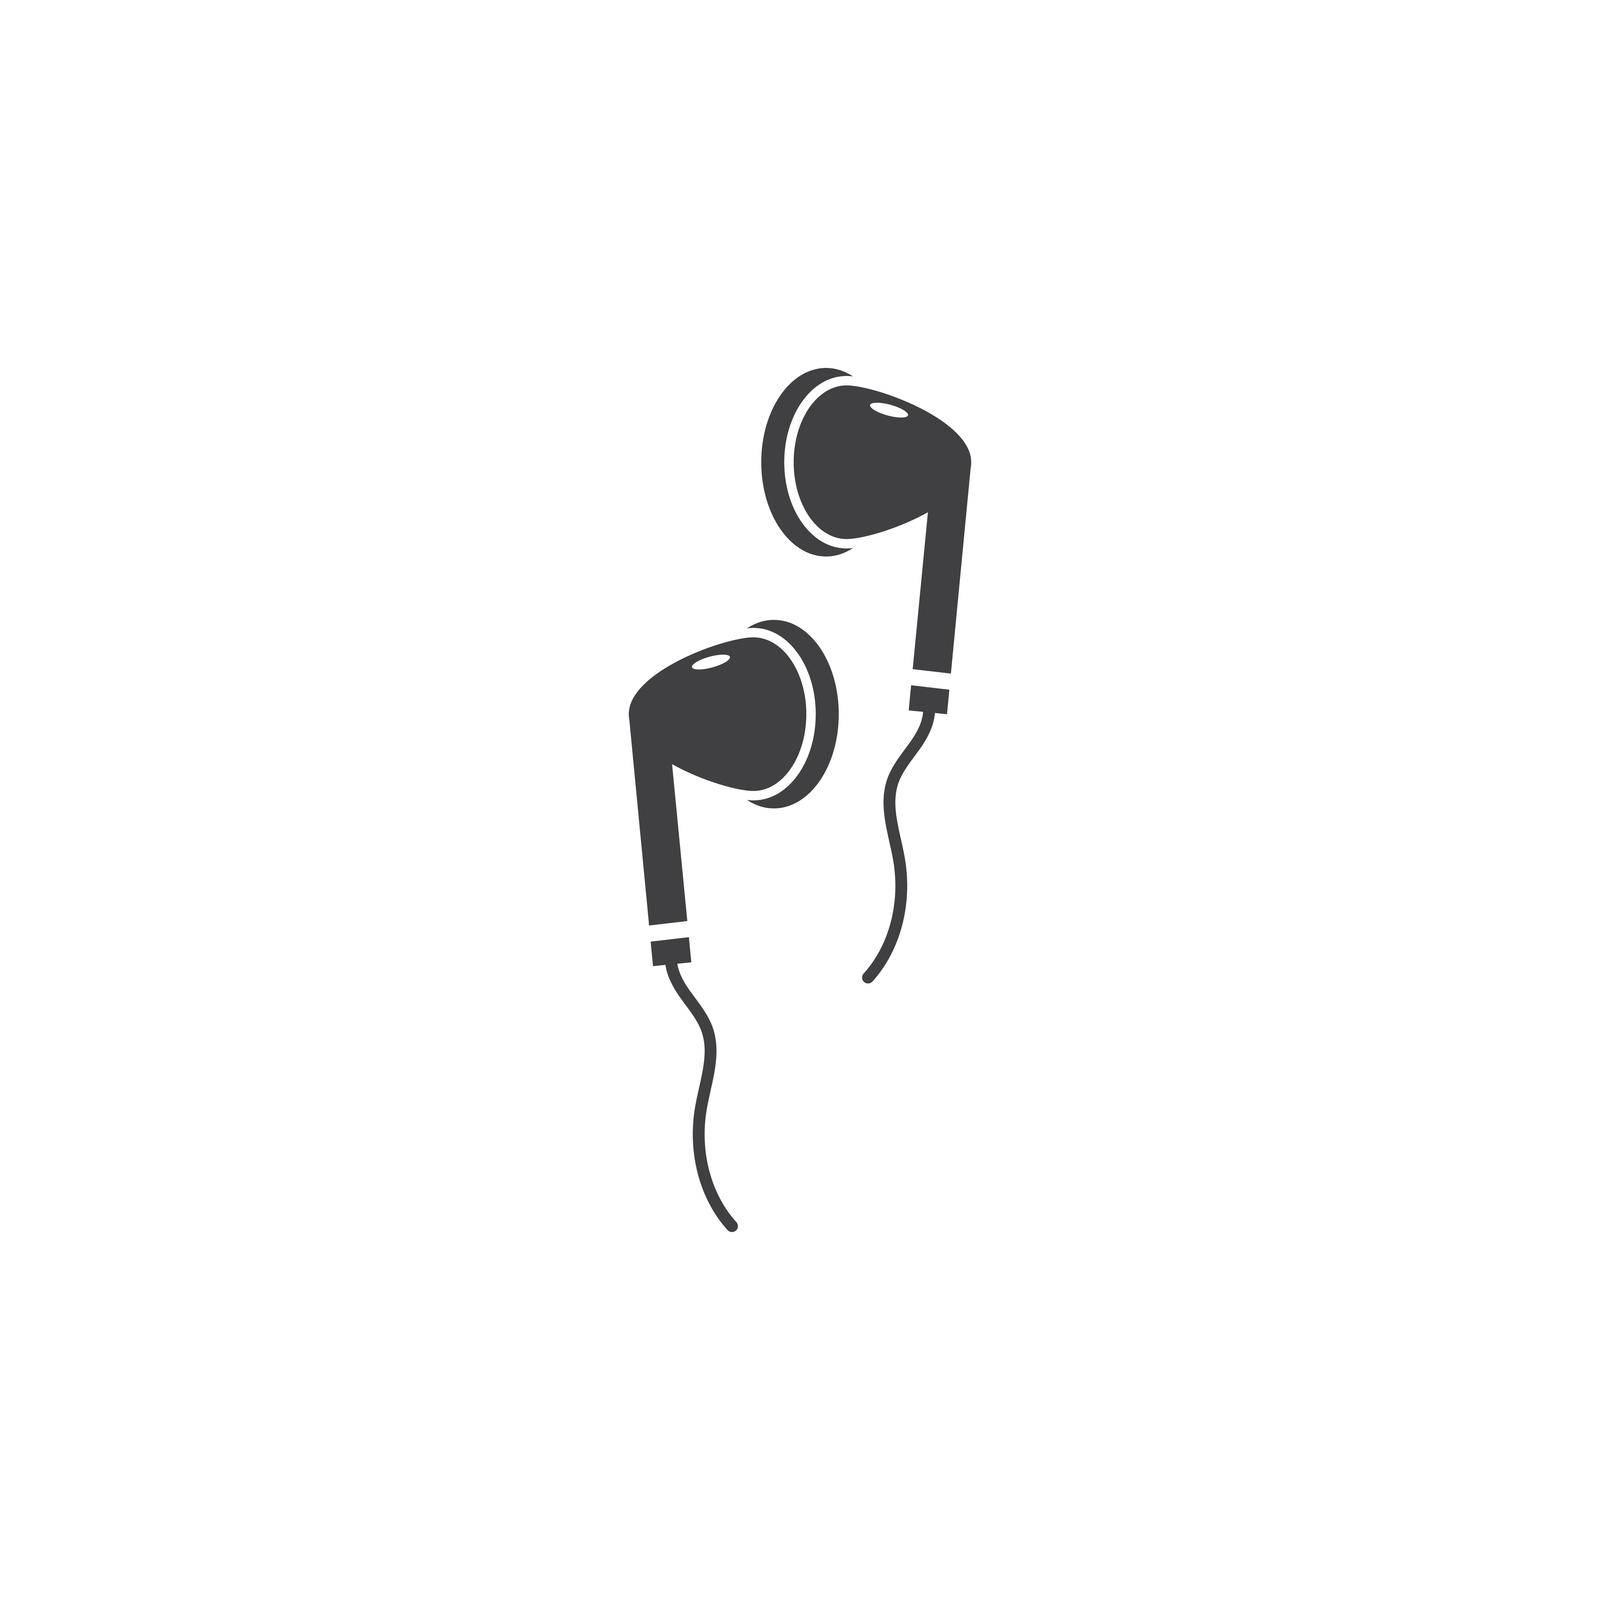 Headphone, earphone icon vector flat design